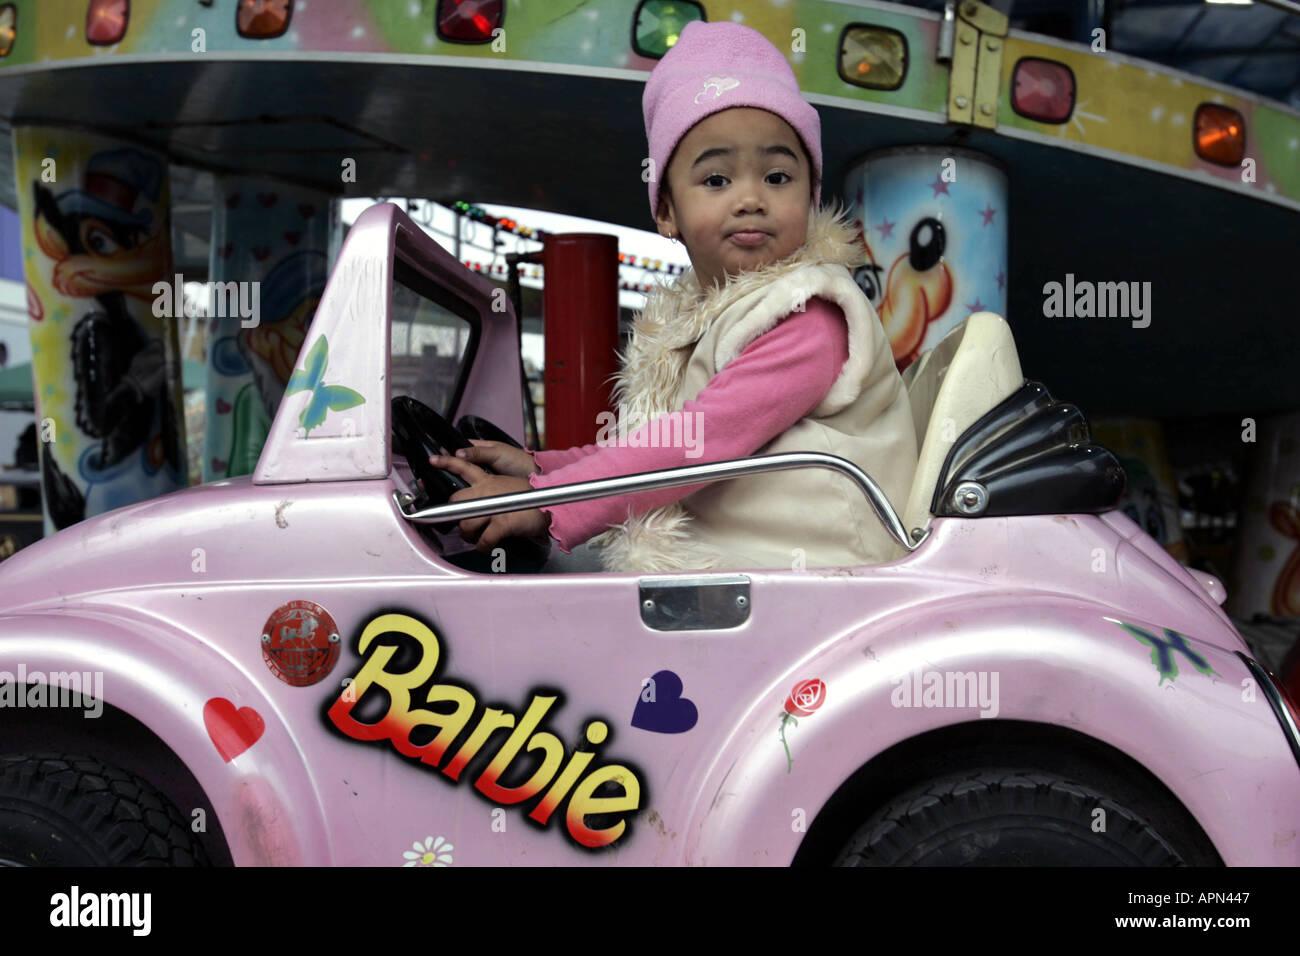 Barbie Electric Car: Barbie Car Stock Photos & Barbie Car Stock Images